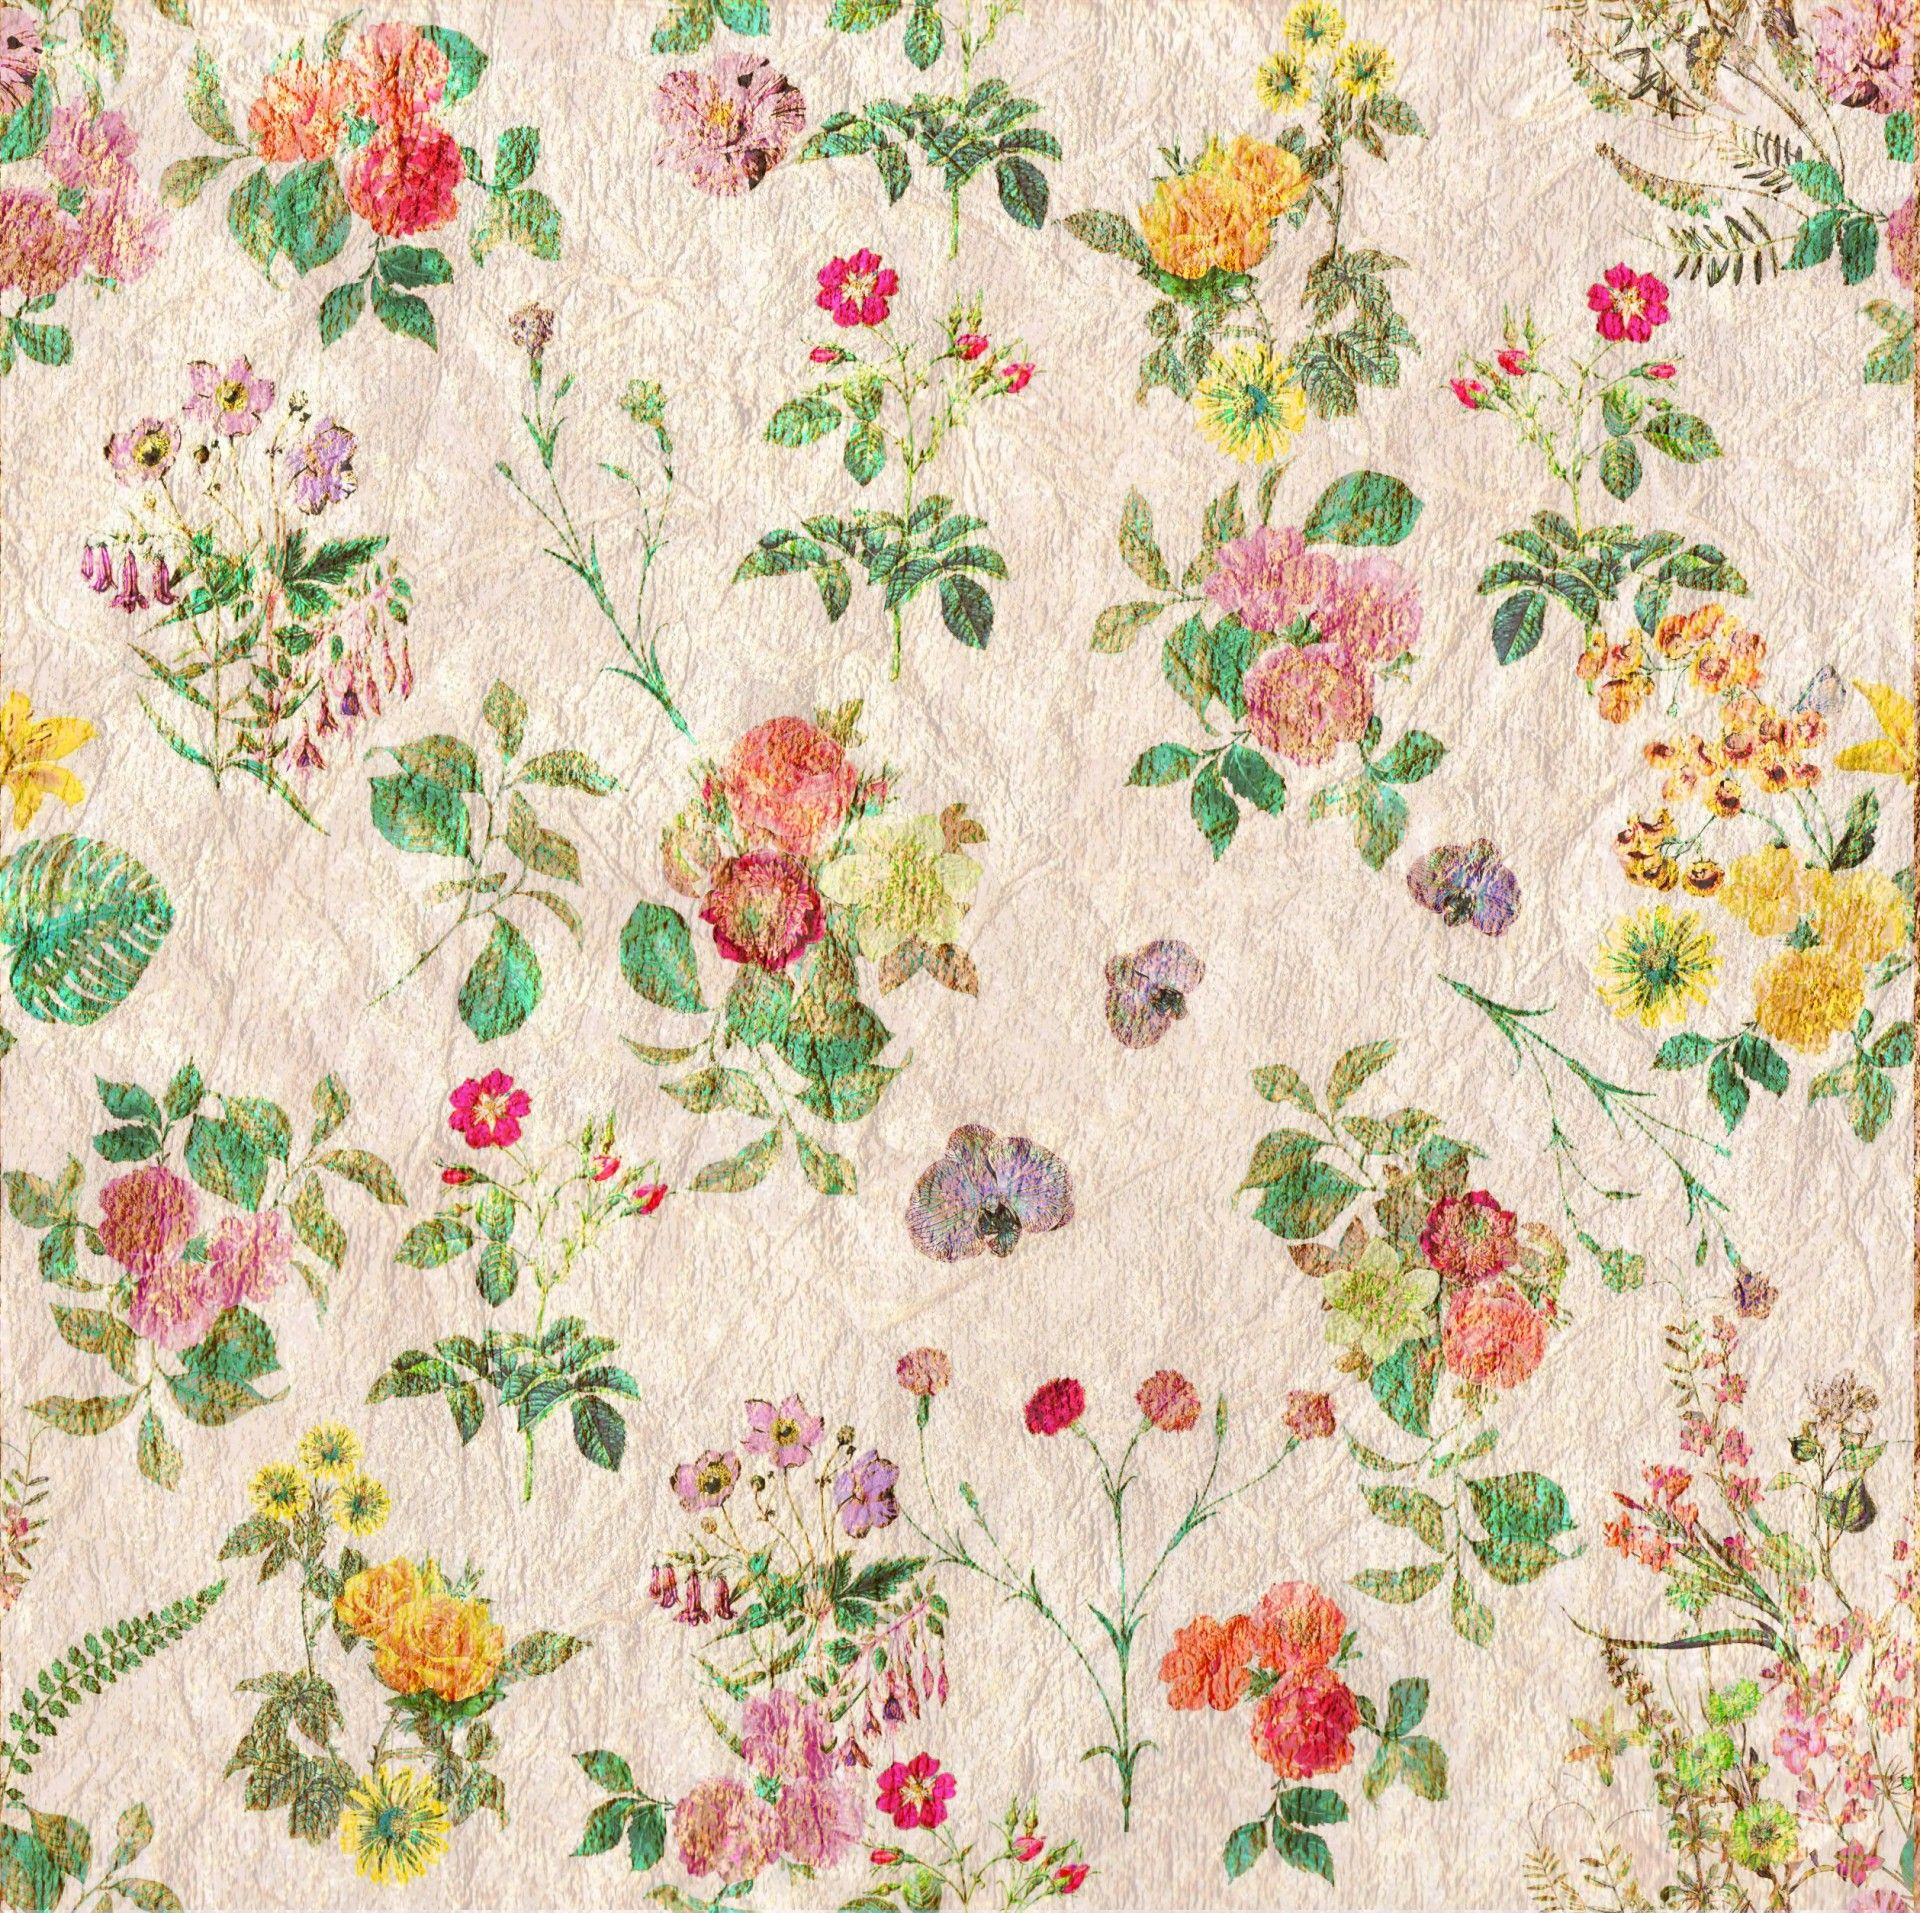 Vintage Flowers Wallpaper  C B Vintage Flower Wallpaper Pattern Purple Free Vector Download